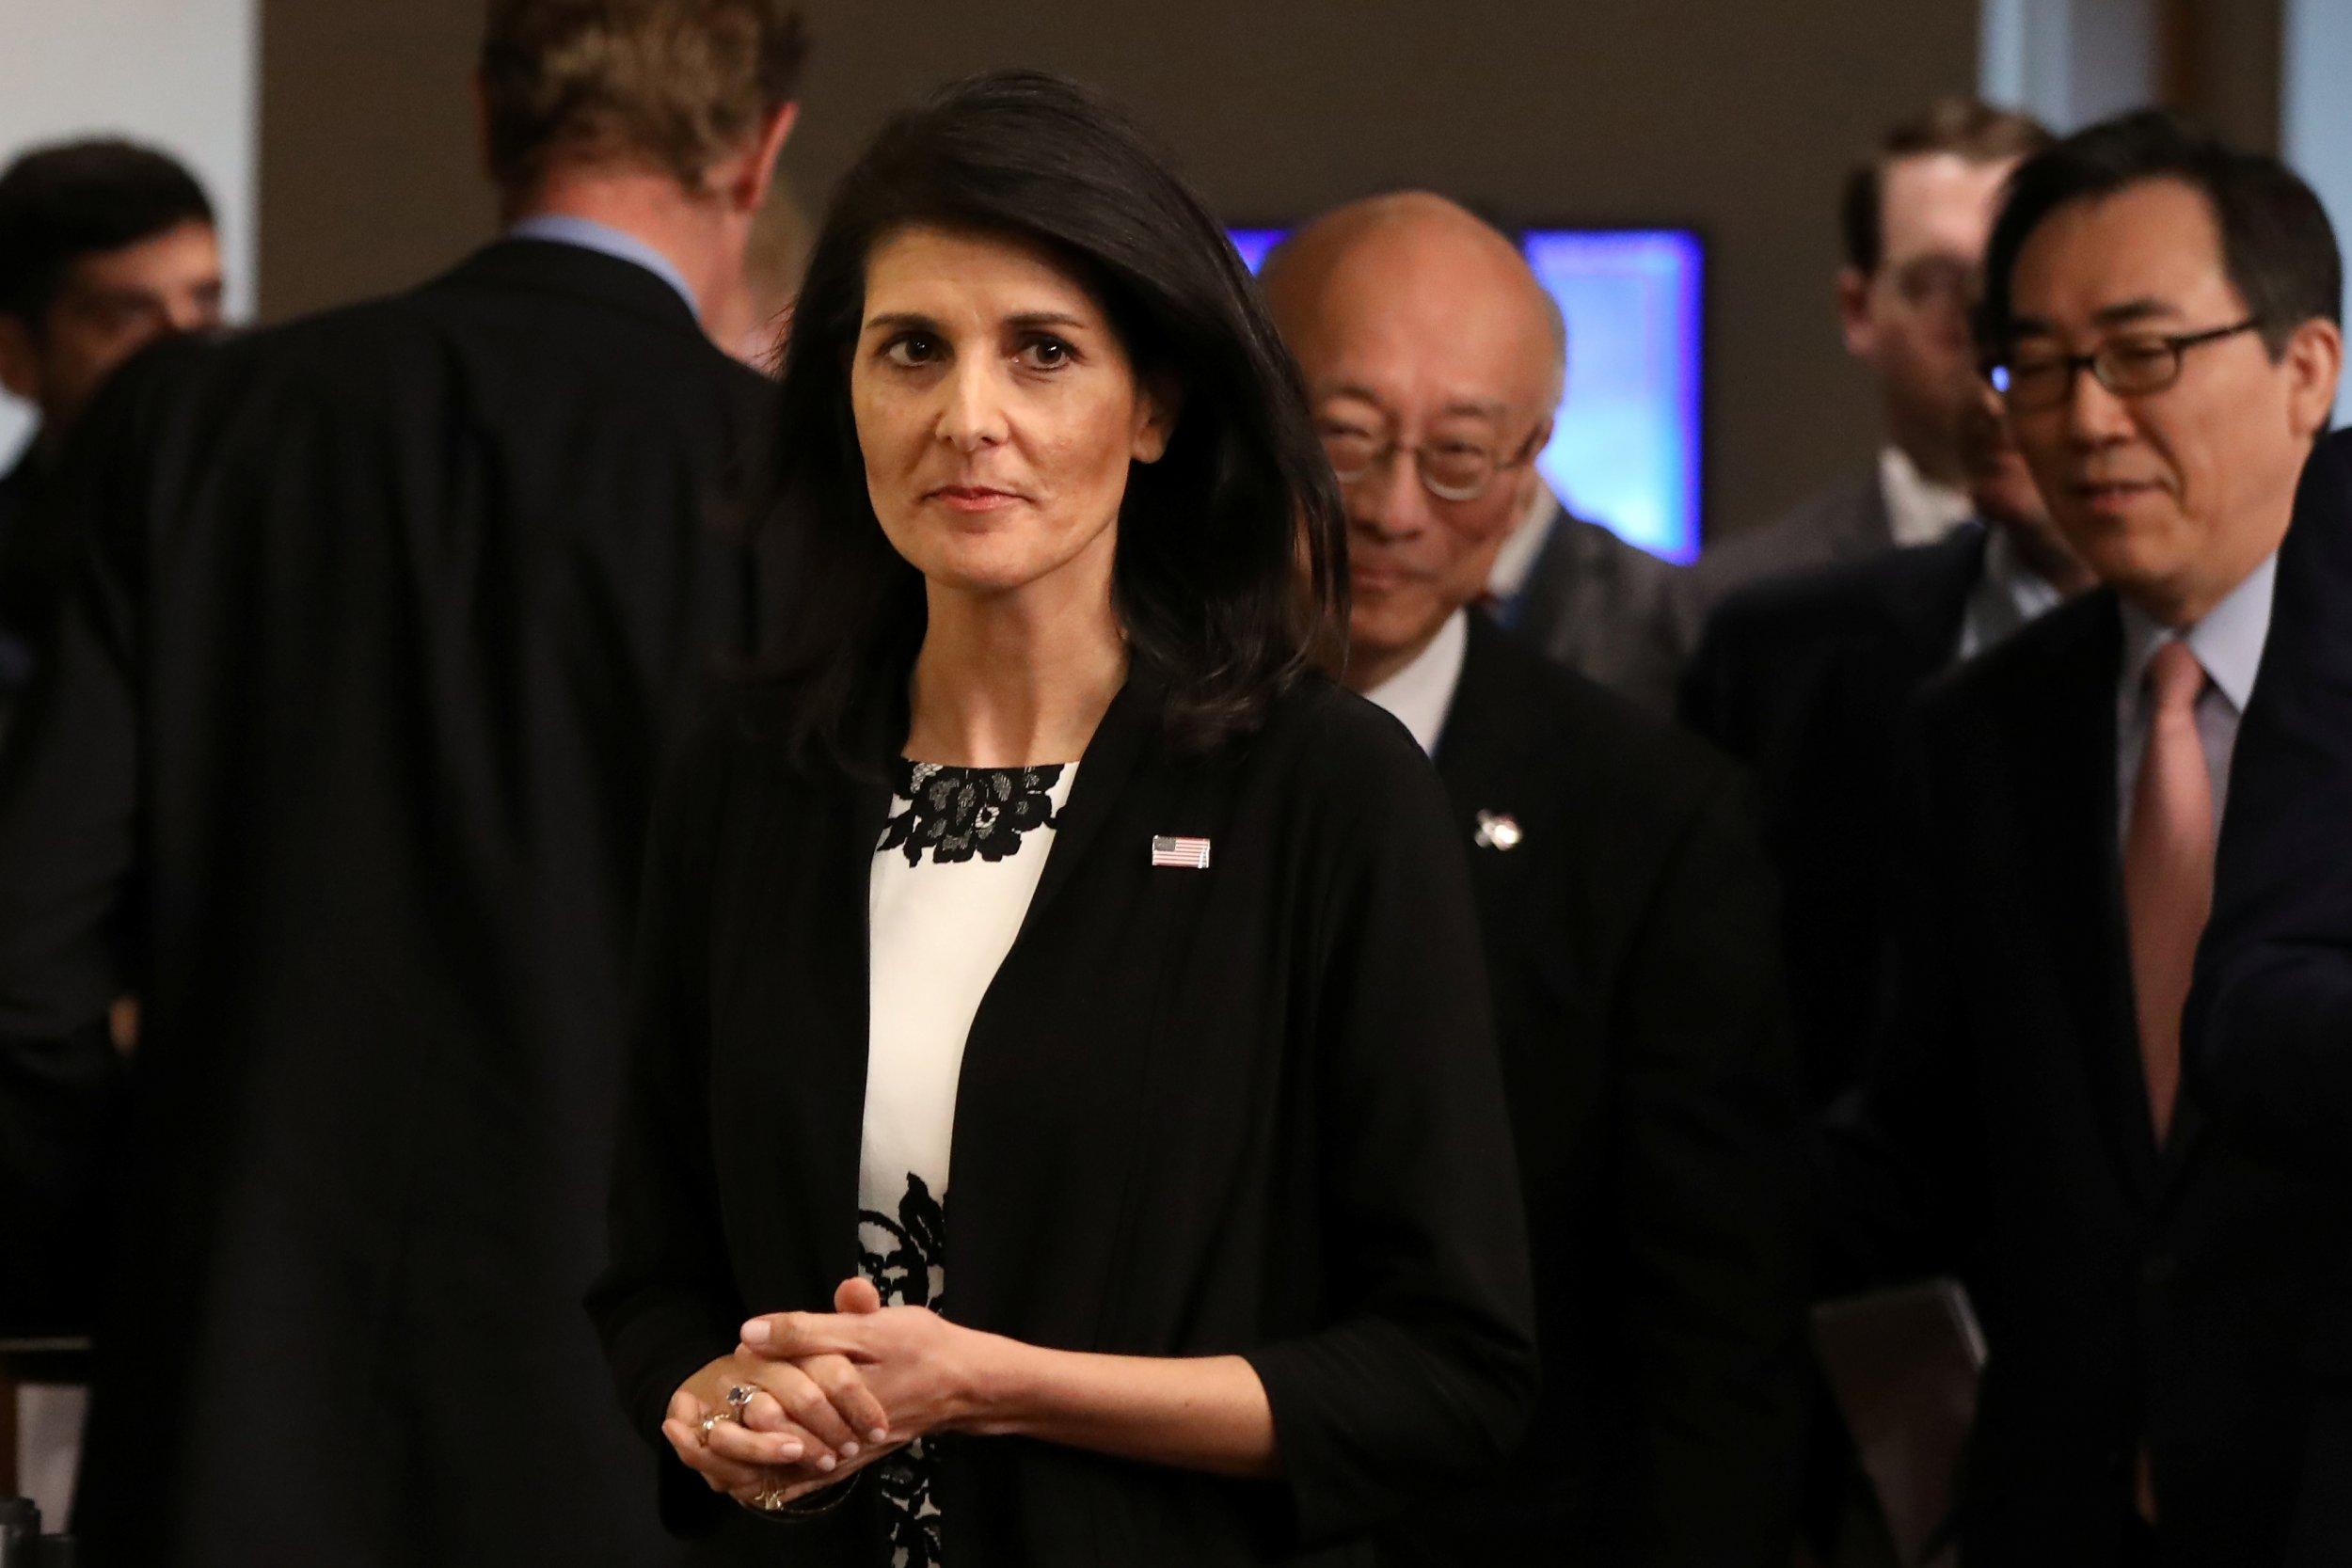 U.S. ambassador to the United Nations Nikki Haley